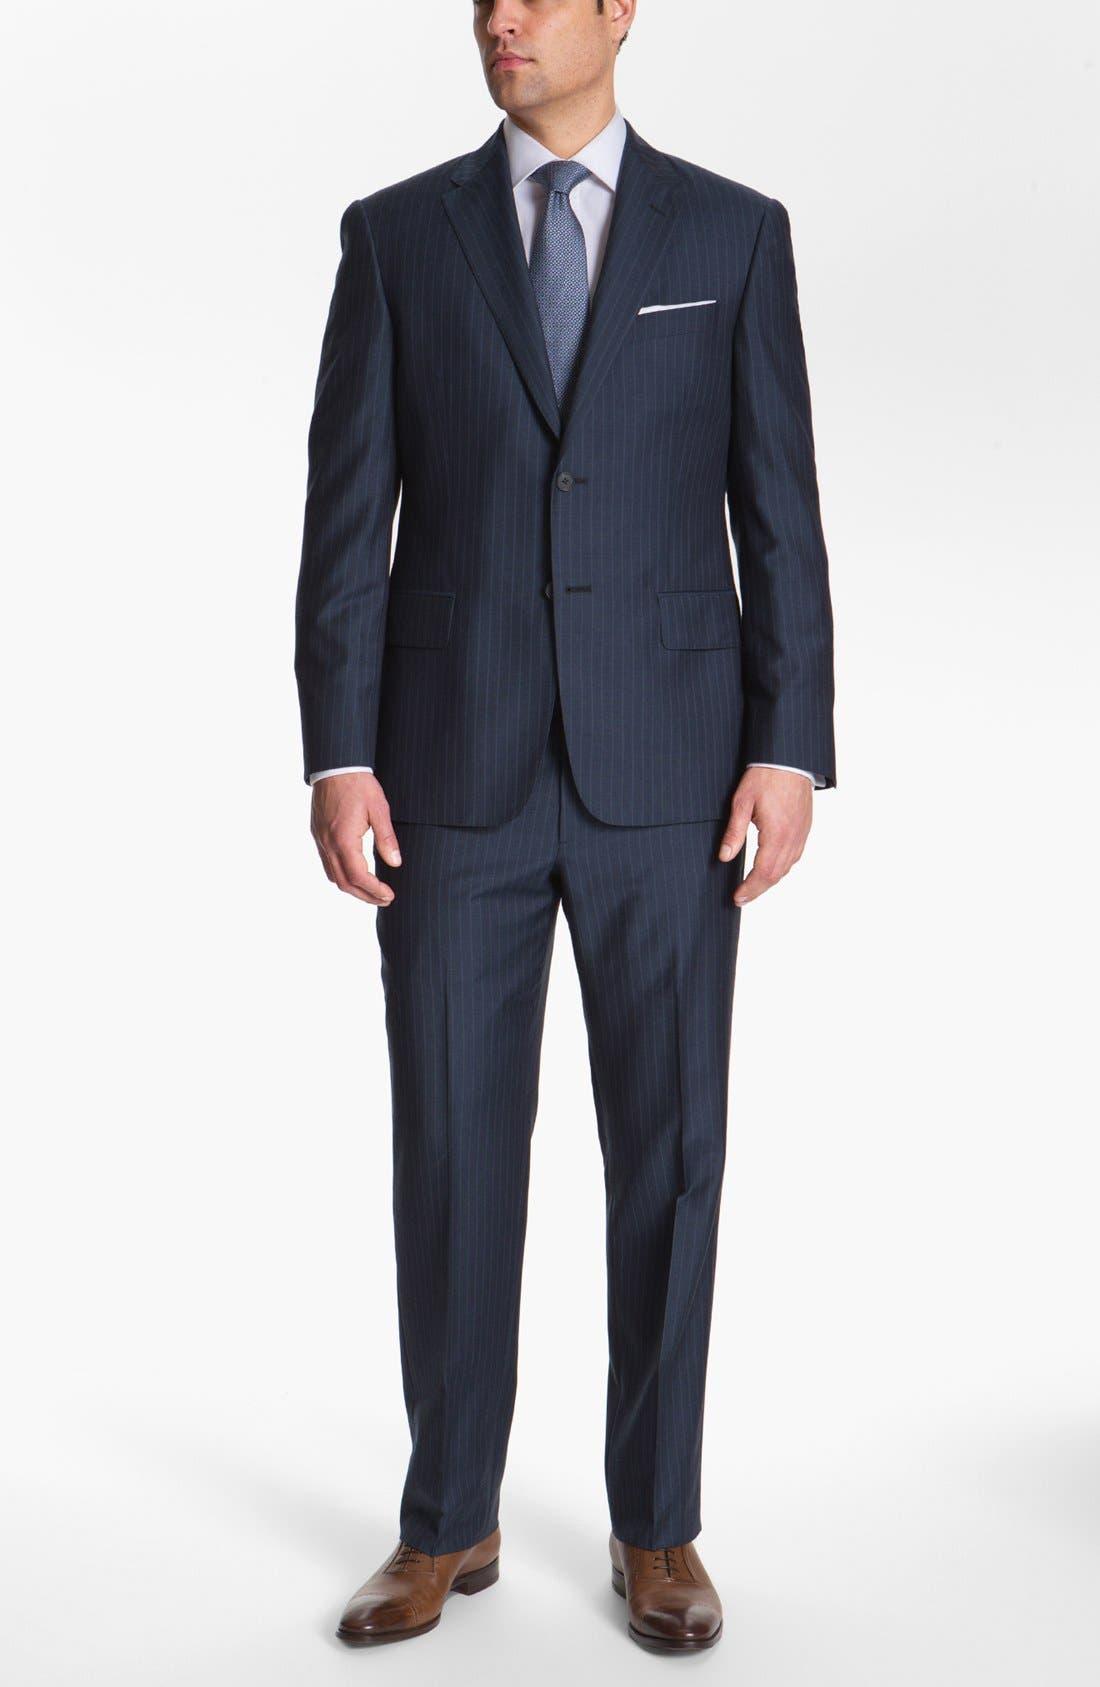 Alternate Image 1 Selected - Joseph Abboud 'Platinum' Stripe Wool Suit